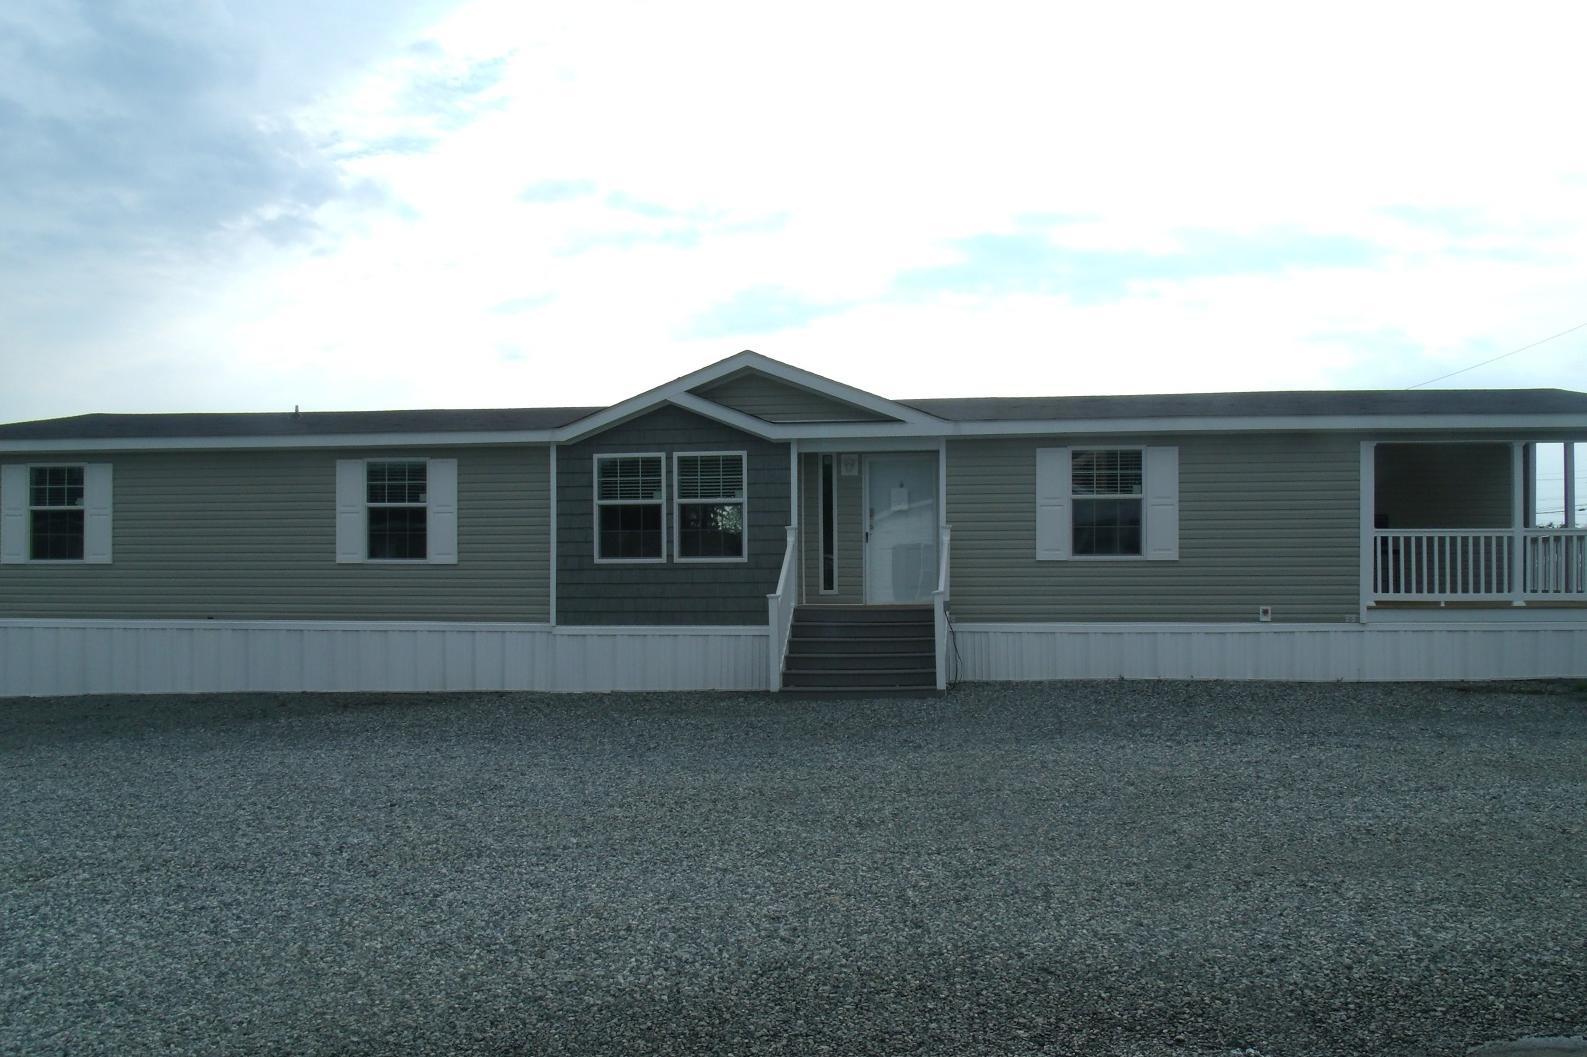 Oakwood homes in burlington nc 336 228 7 for Home builders in burlington nc